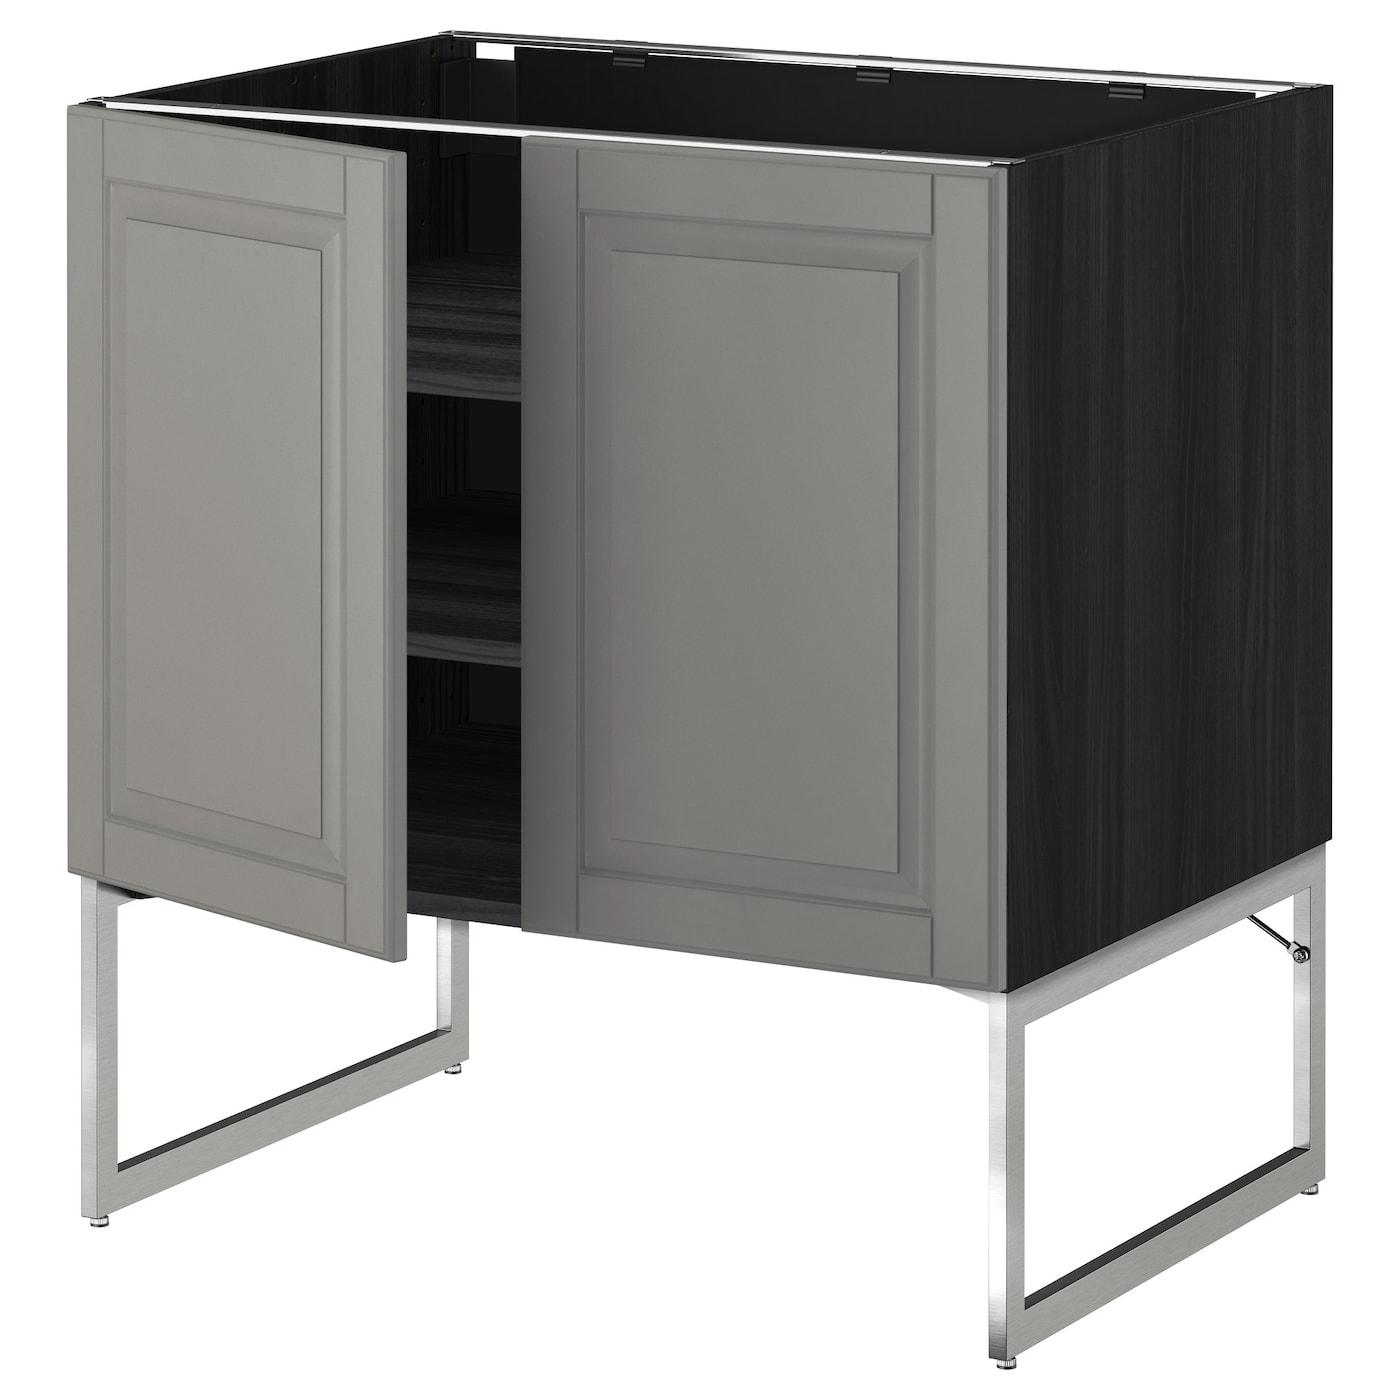 METOD Base Cabinet With Shelves/2 Doors Black/bodbyn Grey 80x60x60 Cm